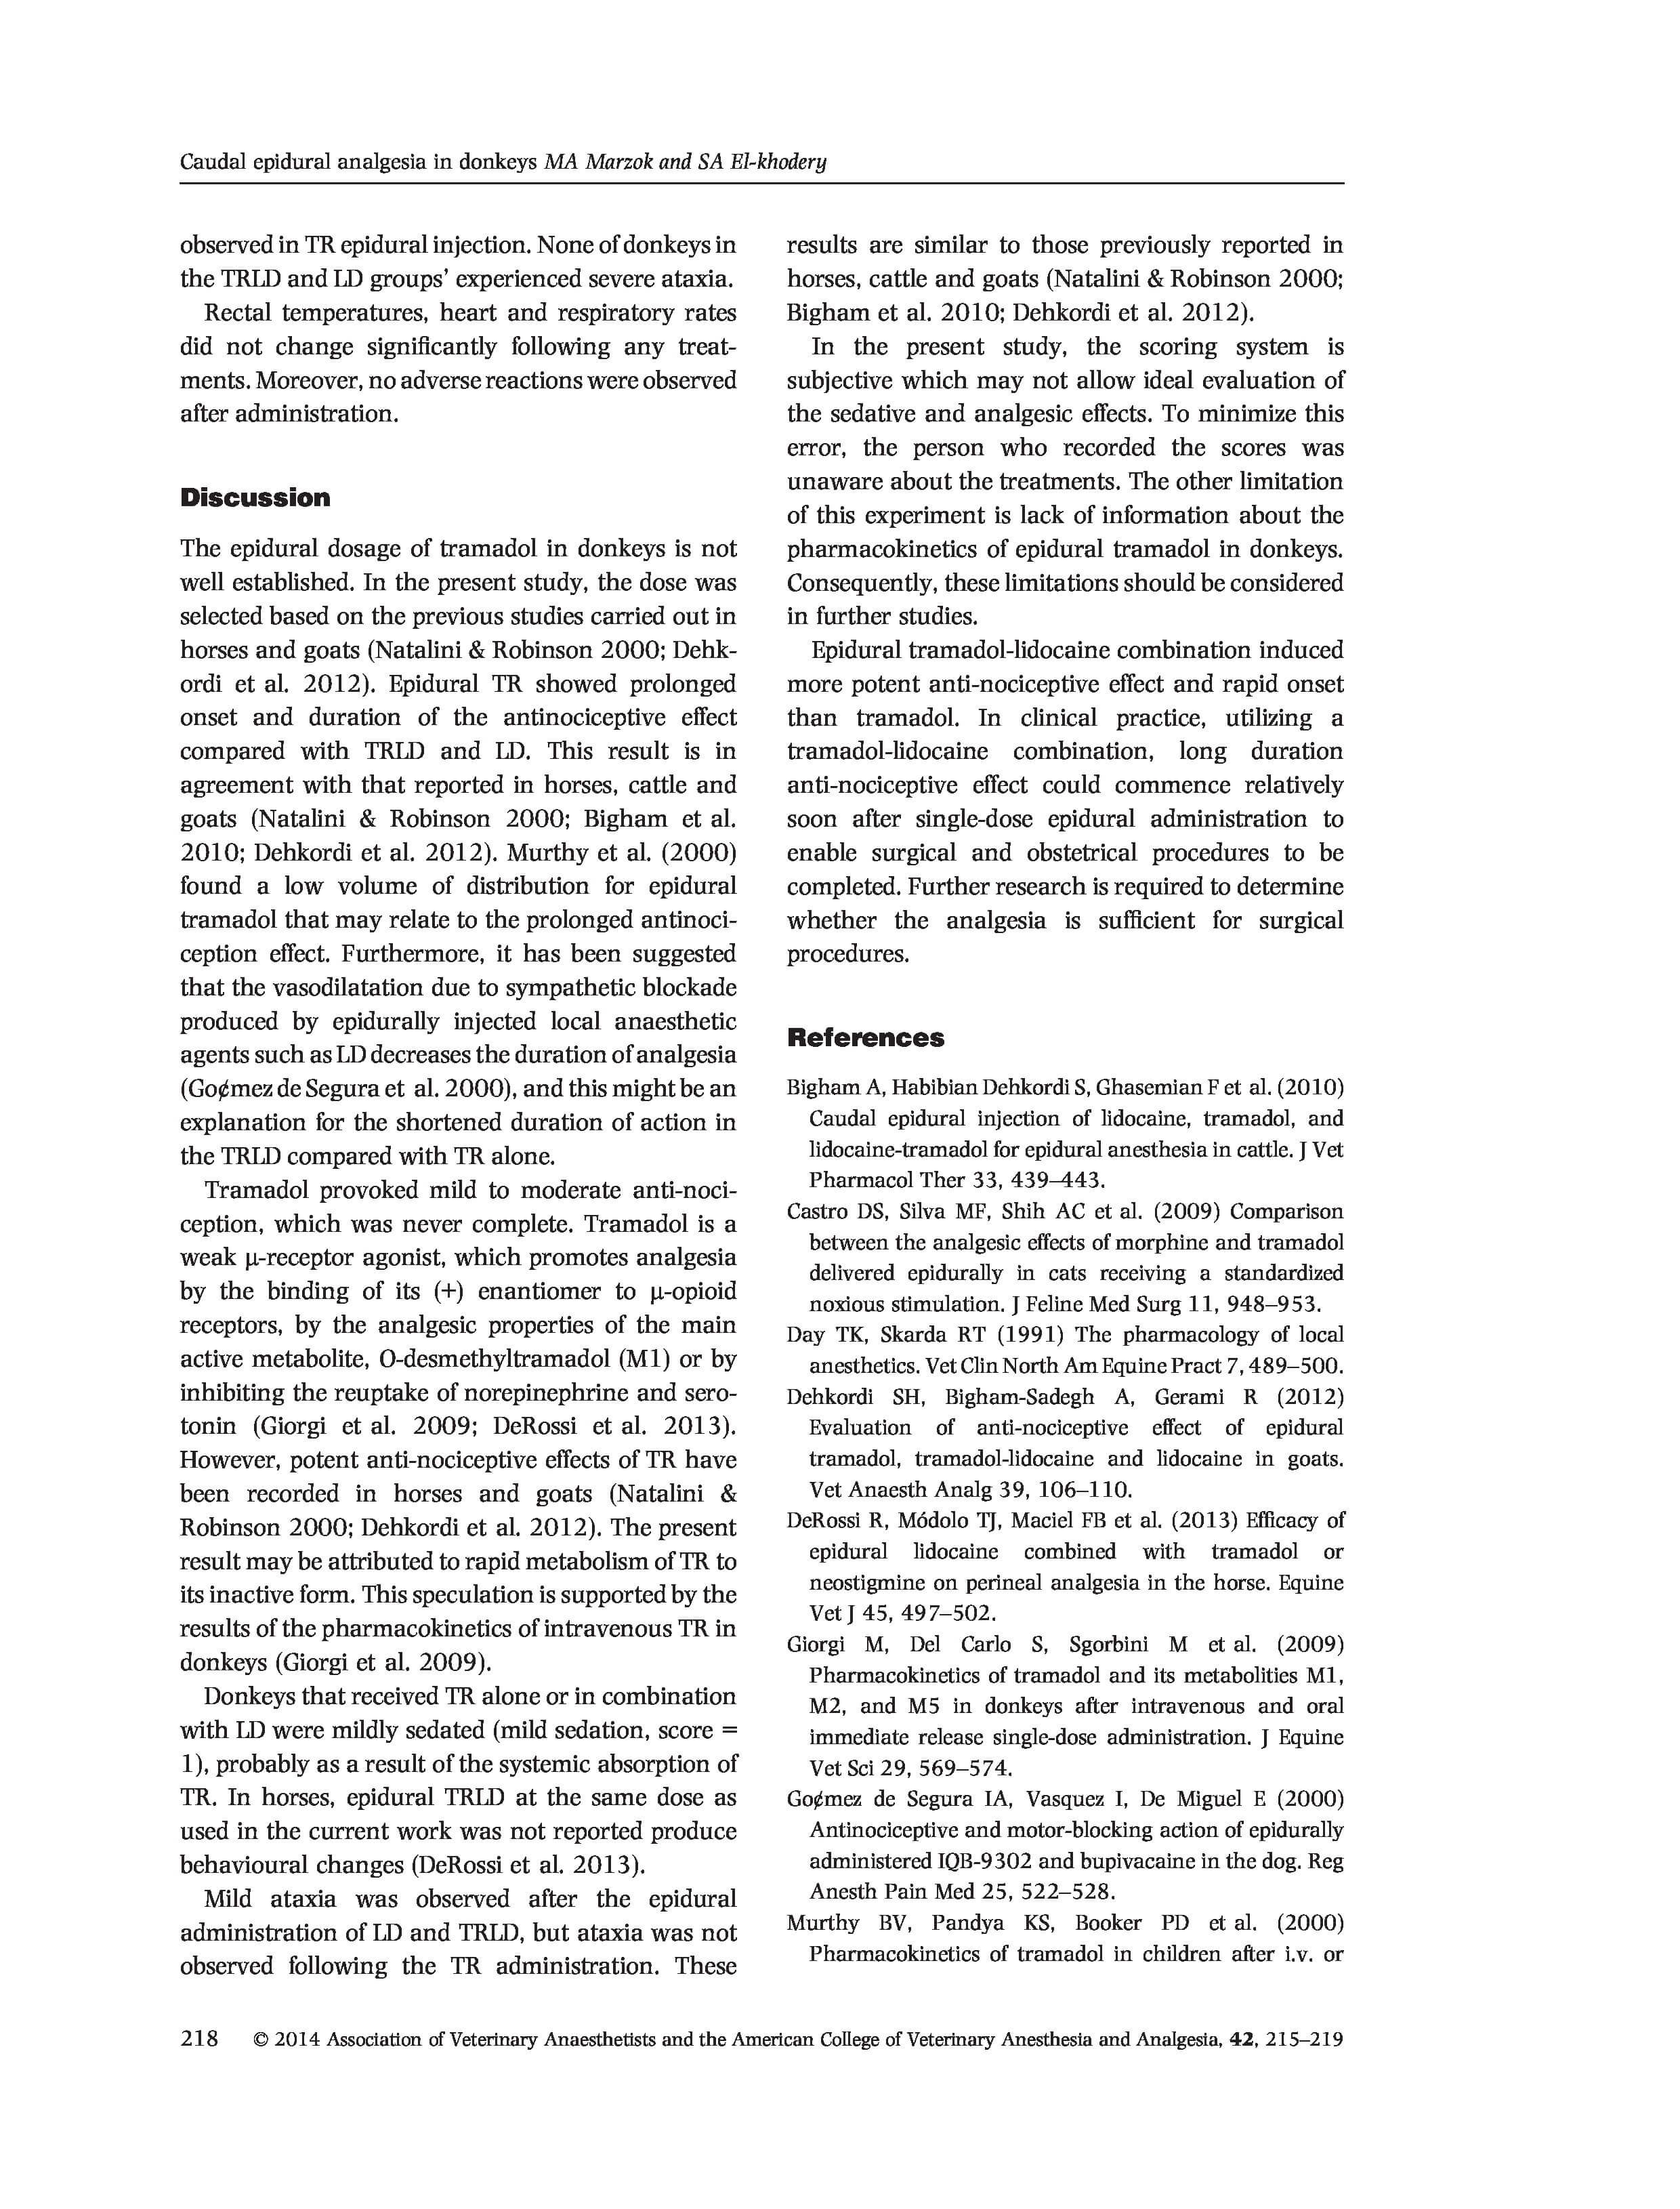 page-3 (1).jpg